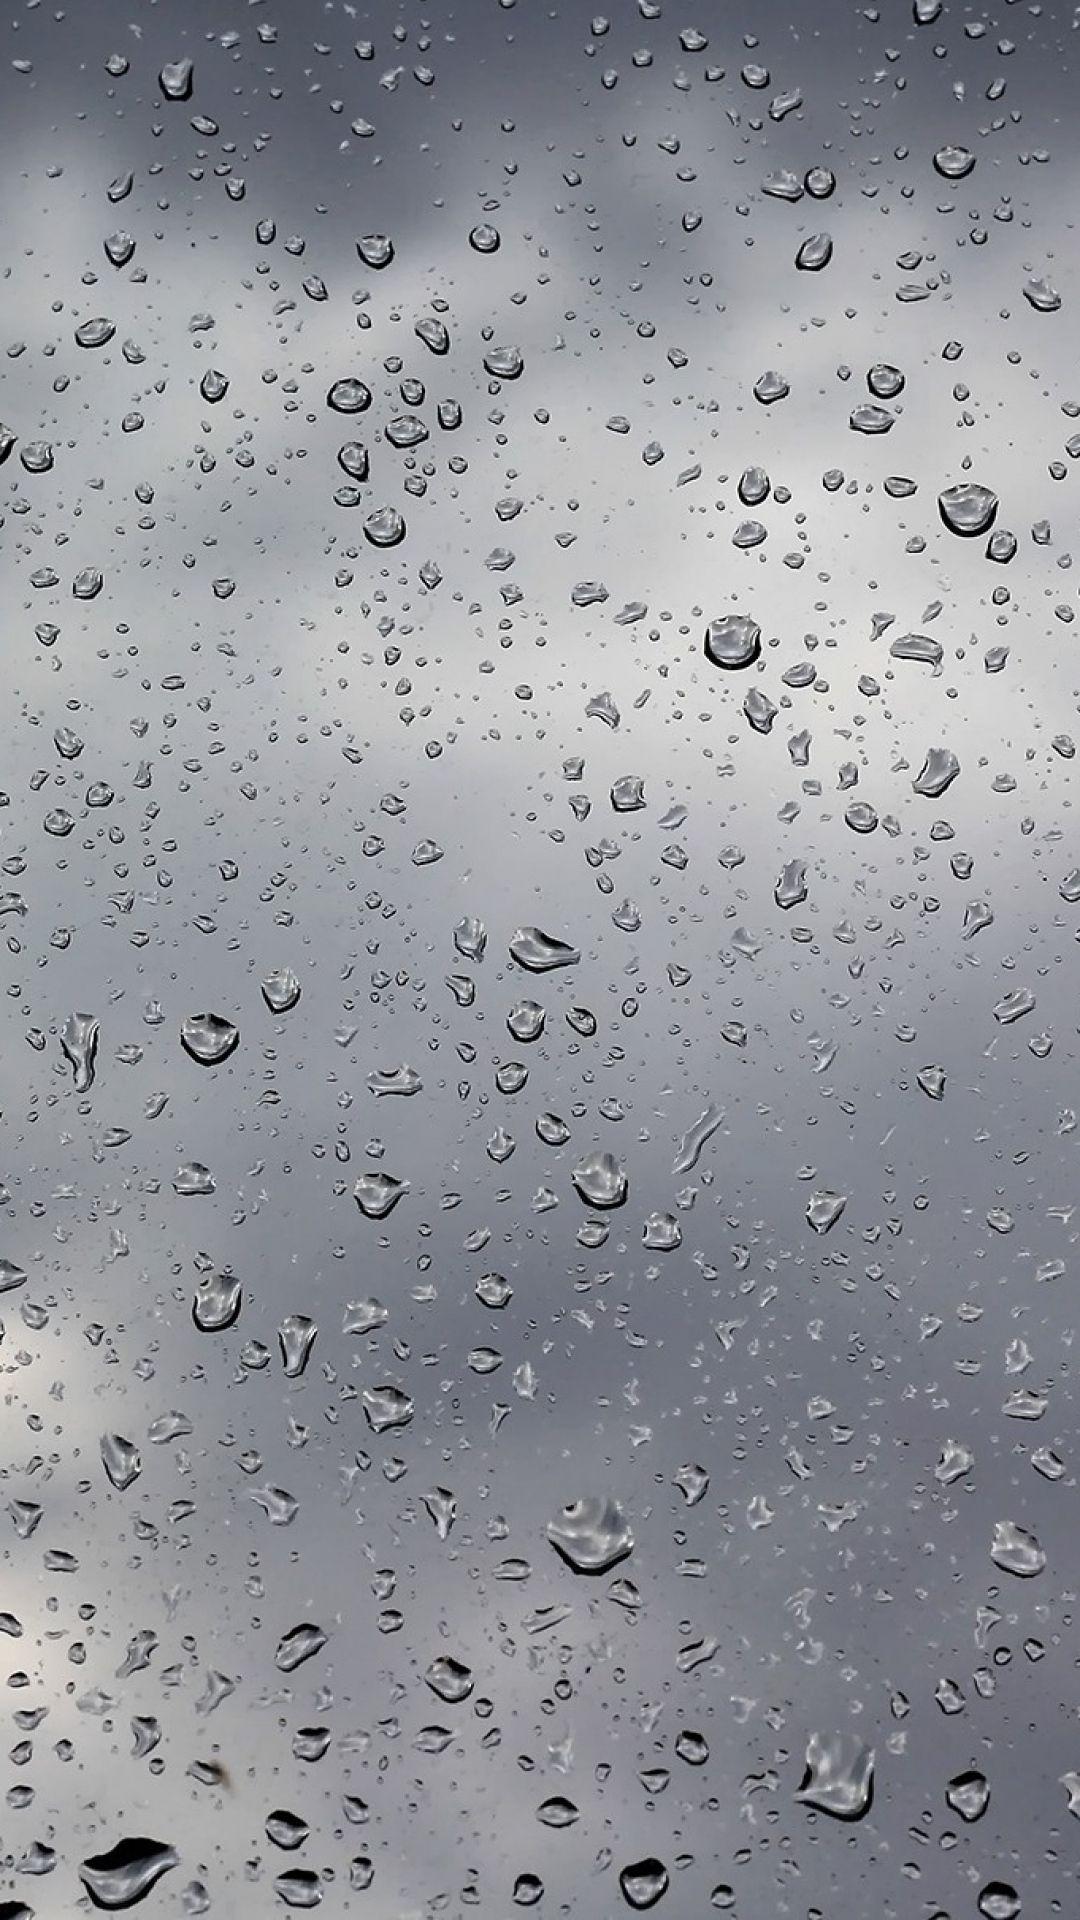 Great Wallpaper Mobile Rain - 25639b138635458671ab665b0ace0c88  Picture_213484.jpg